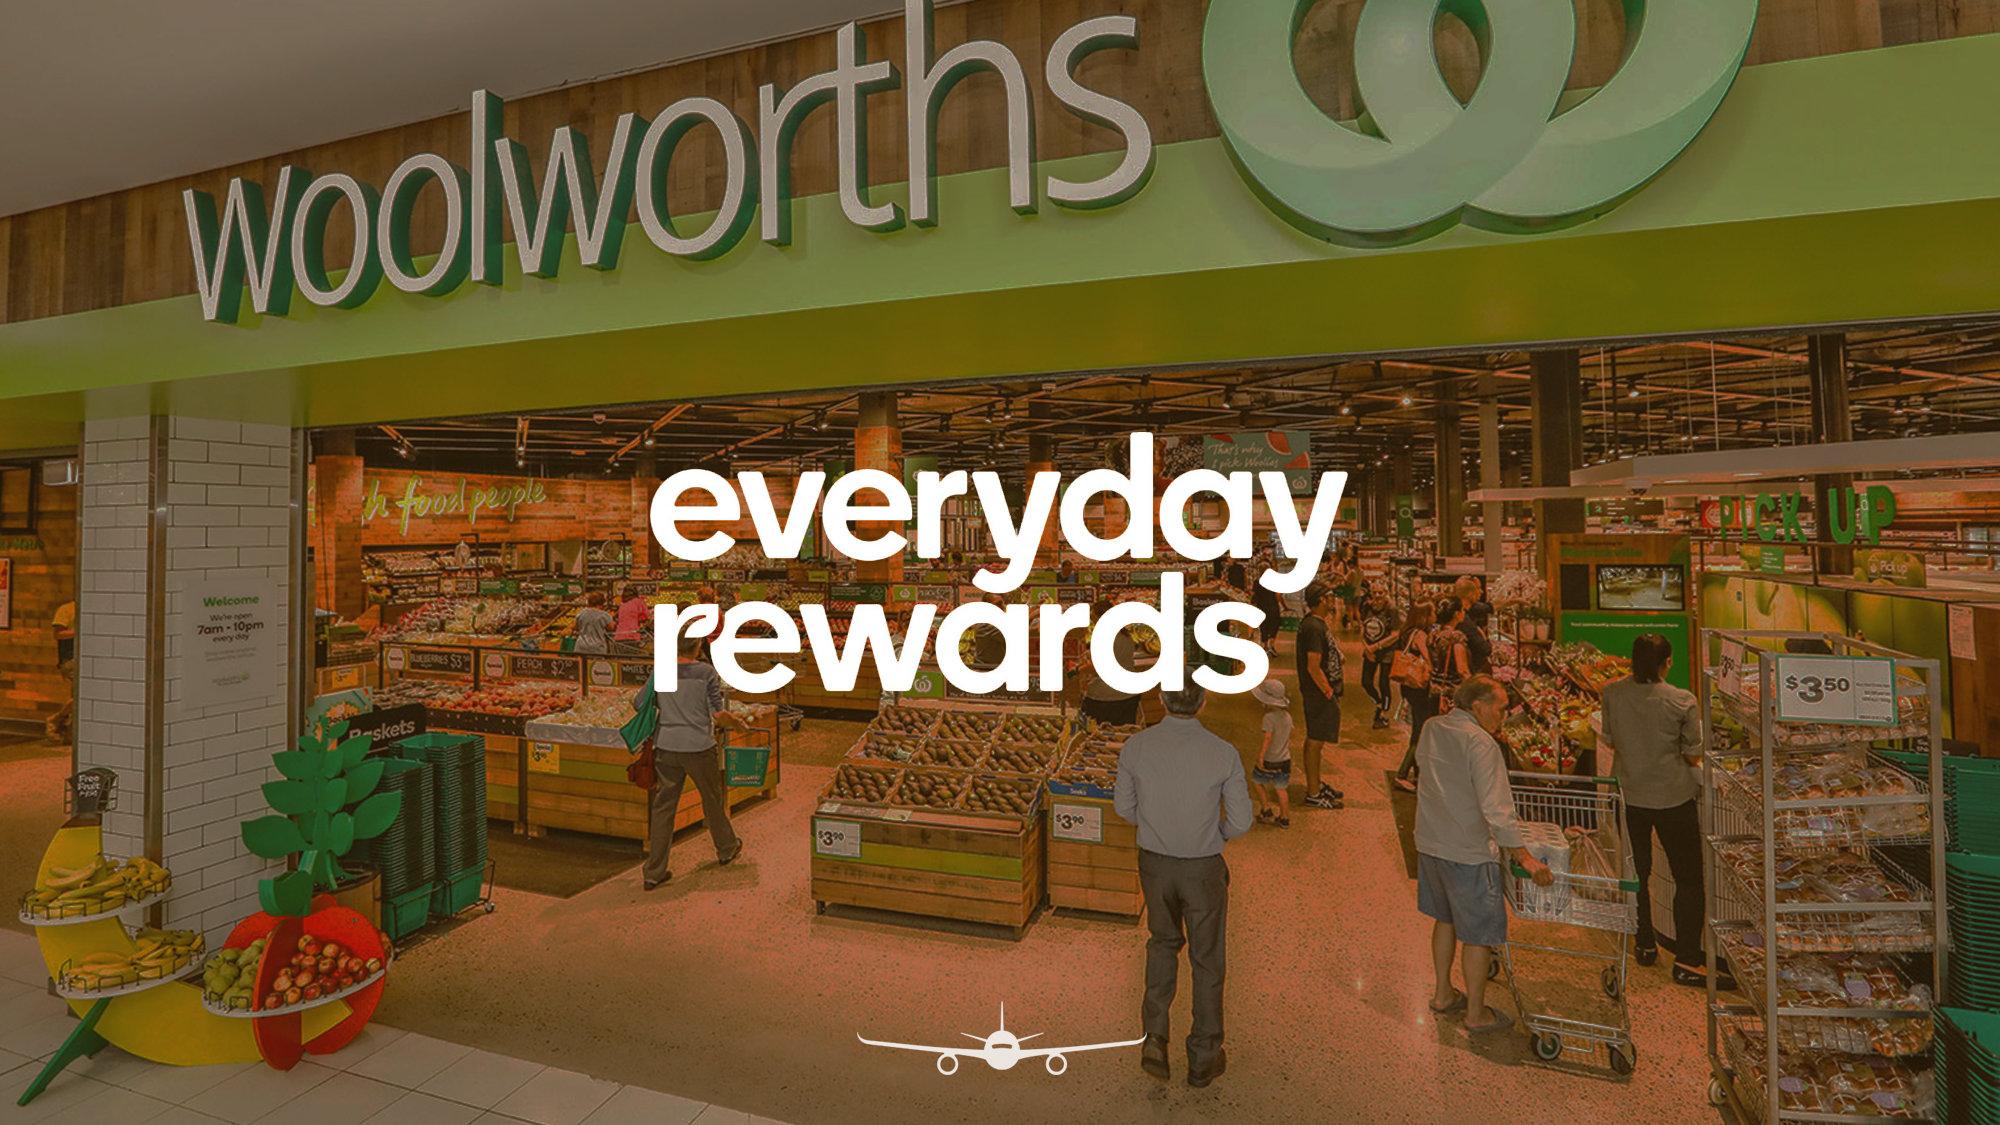 Everyday-Rewards-Woolworths-Store